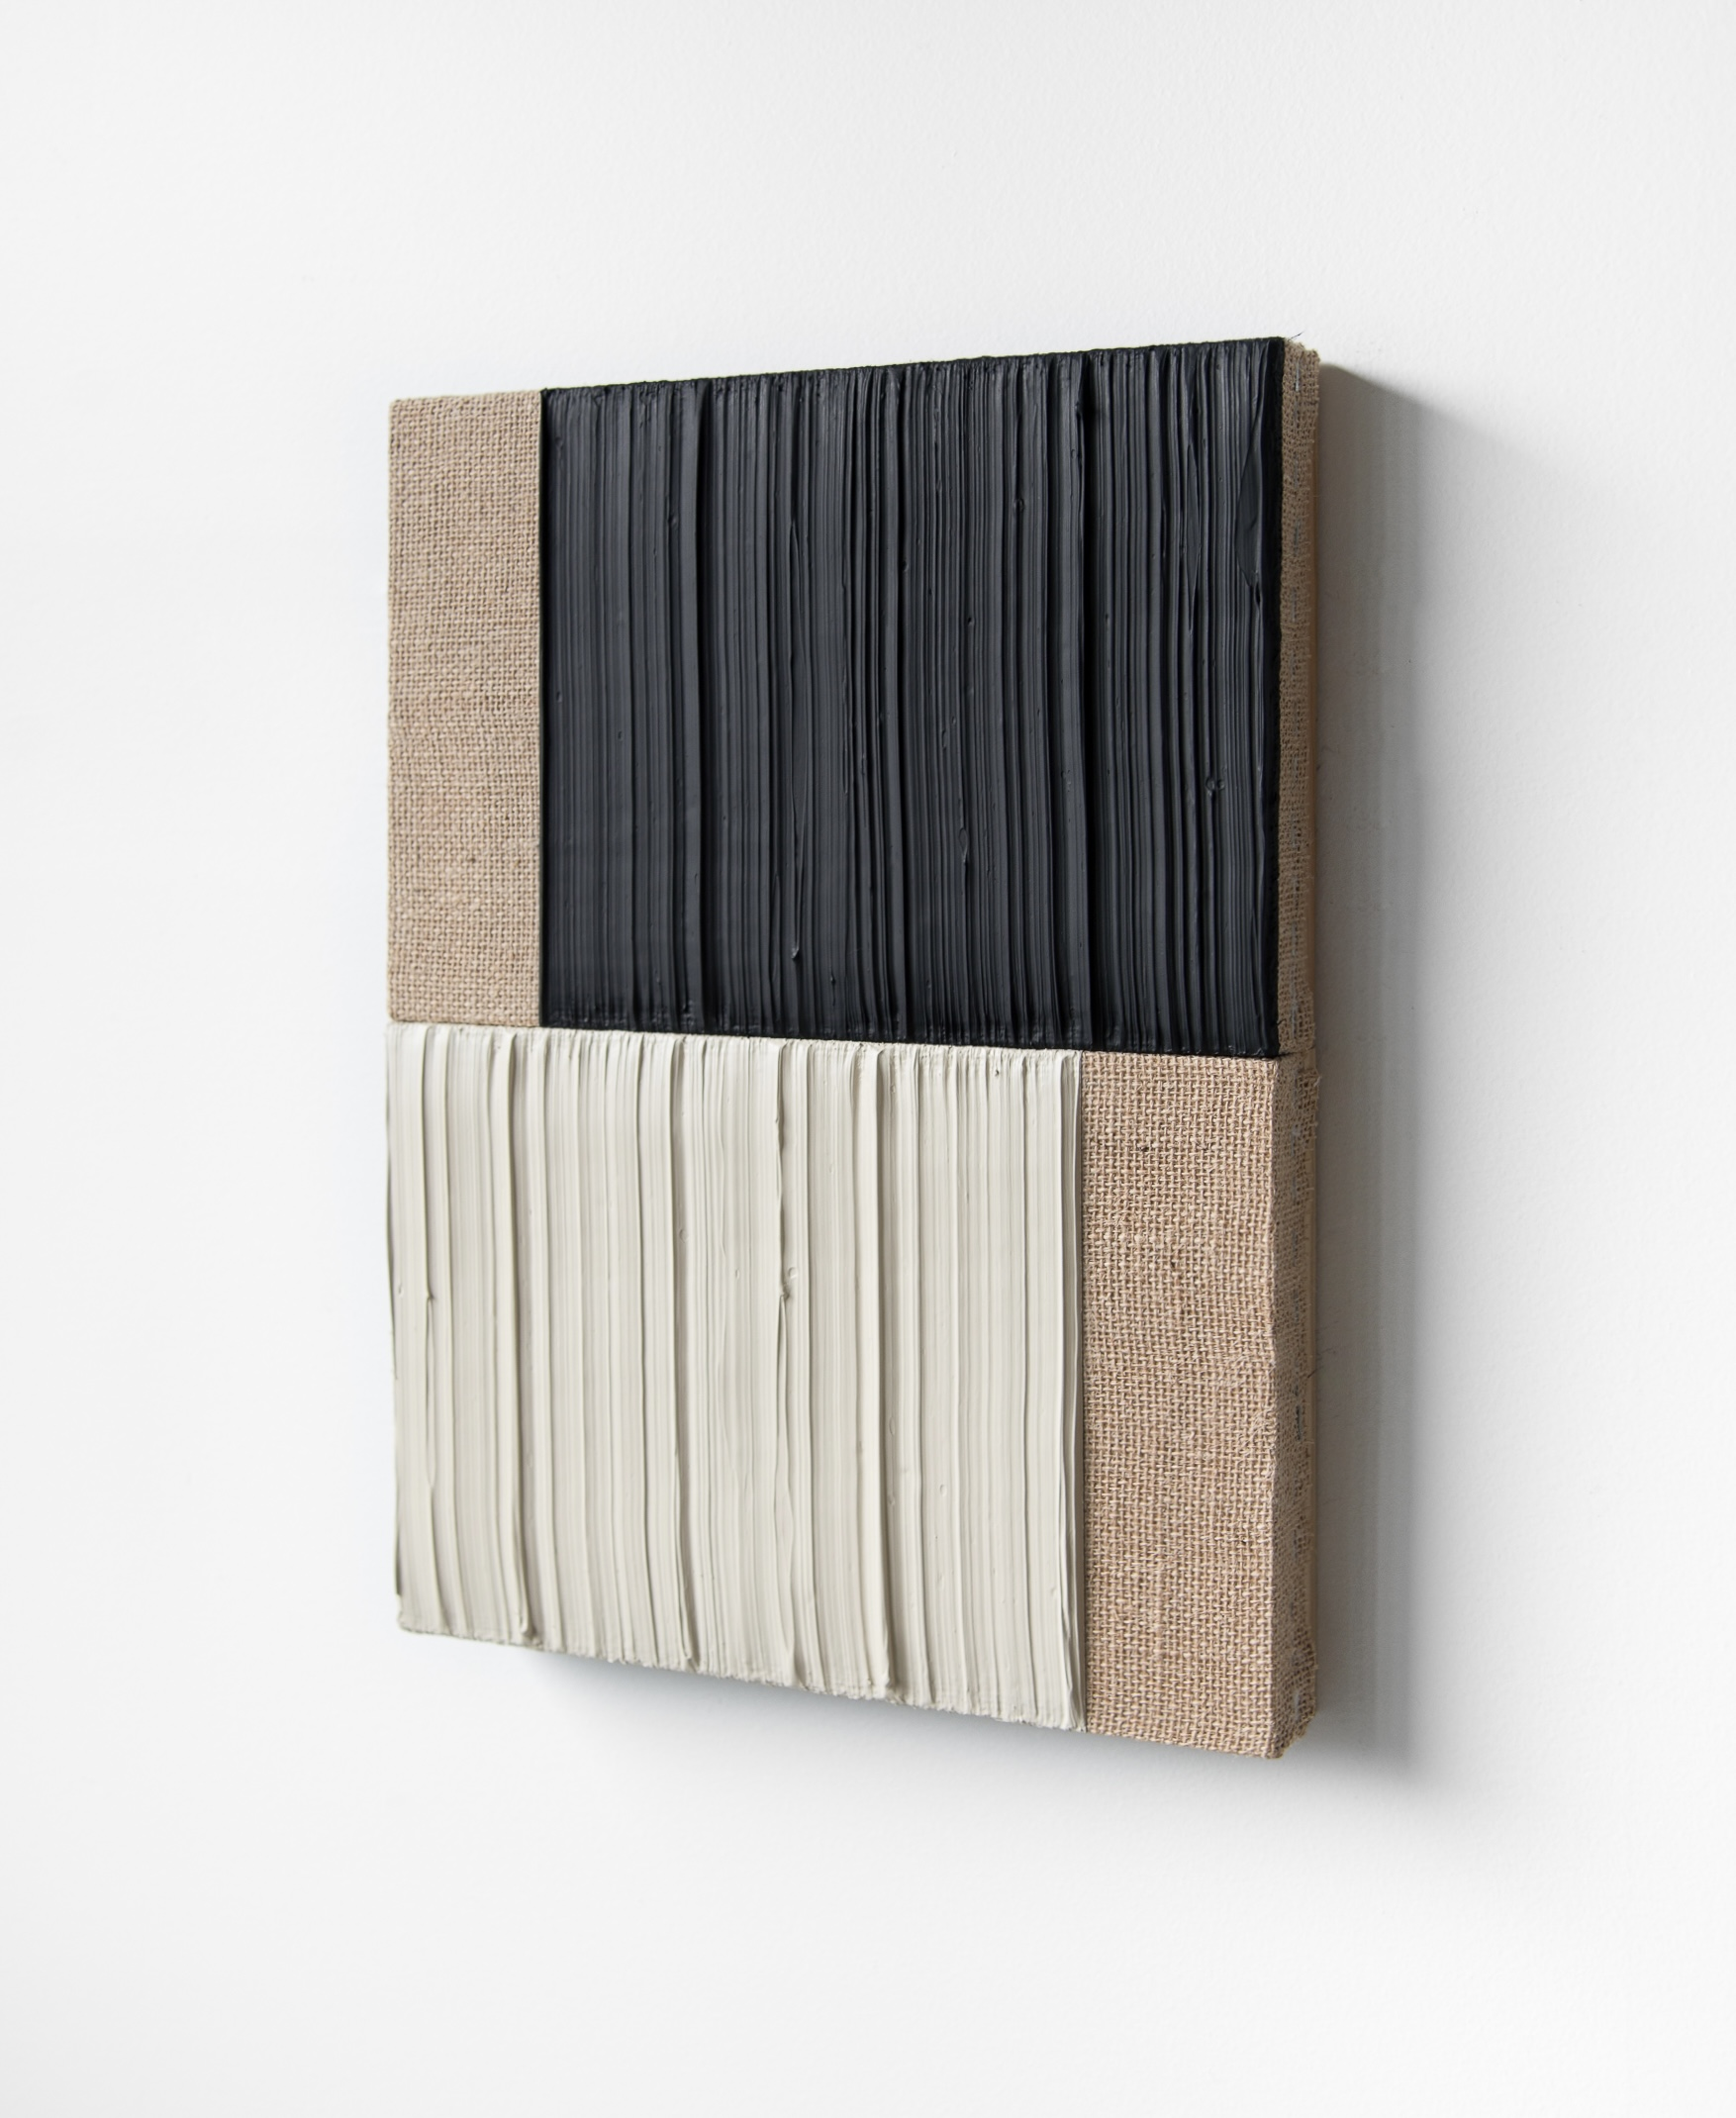 4 Johnny Abrahams Black - White - 12x16inch - 2021